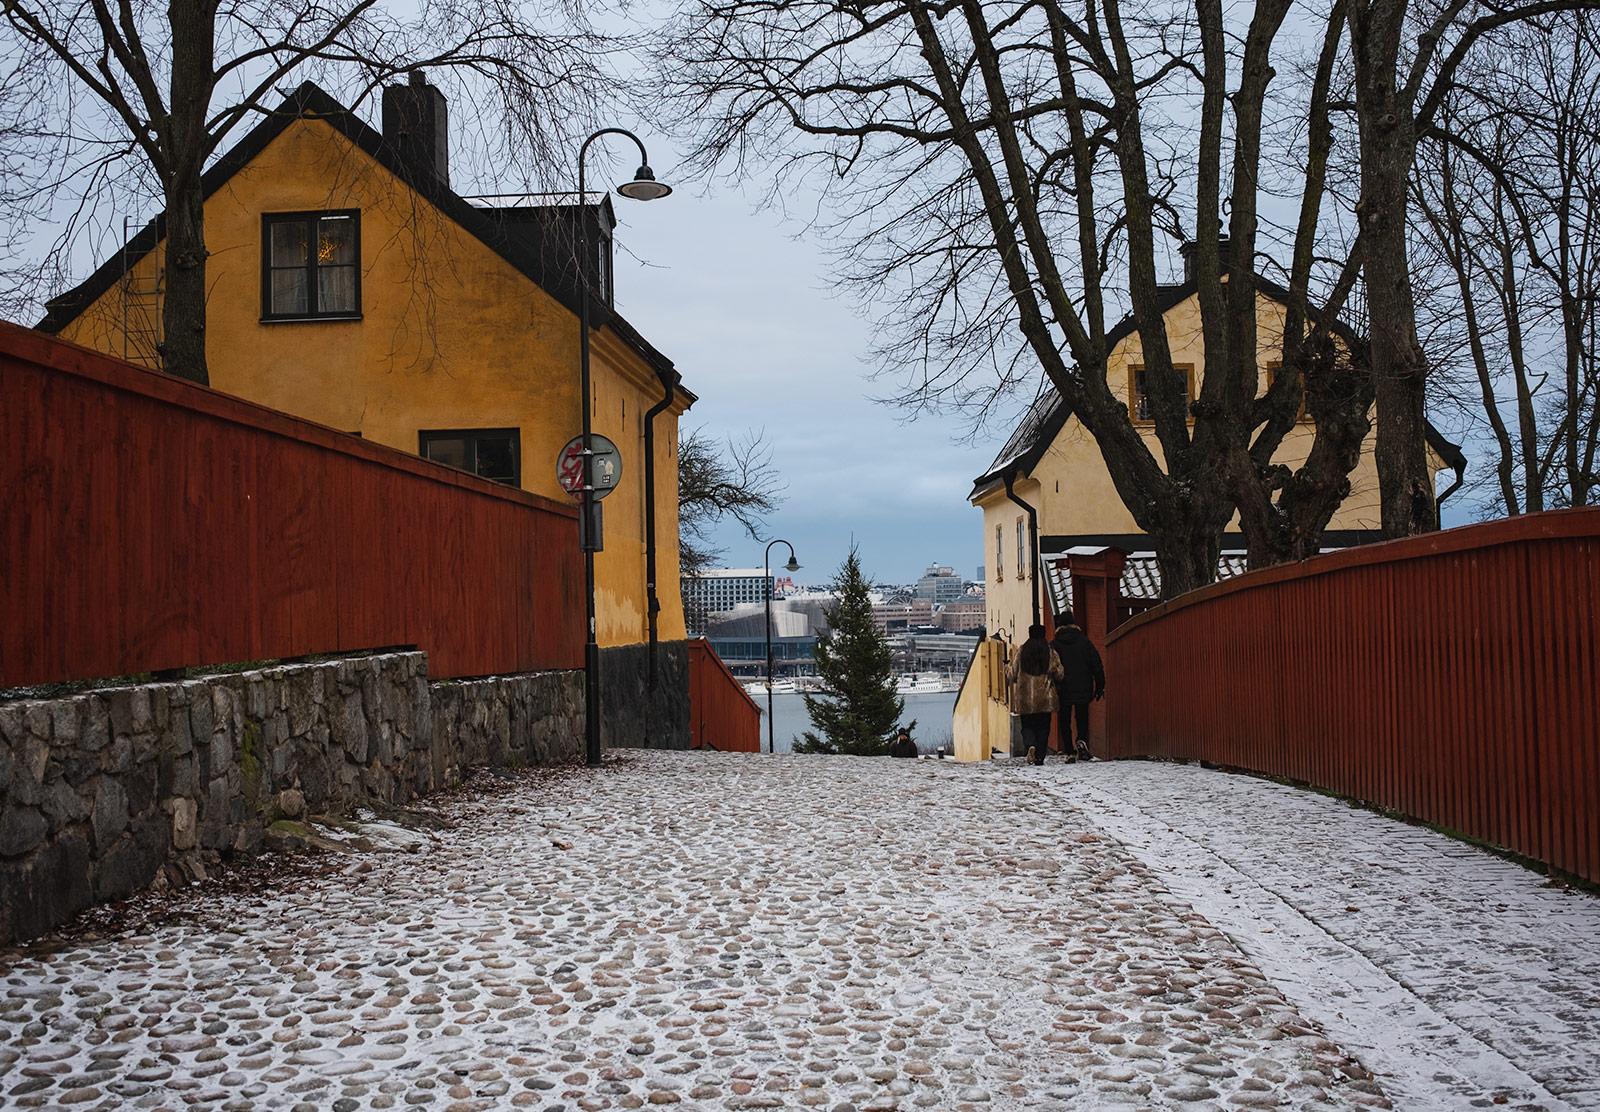 Snow on cobbled street